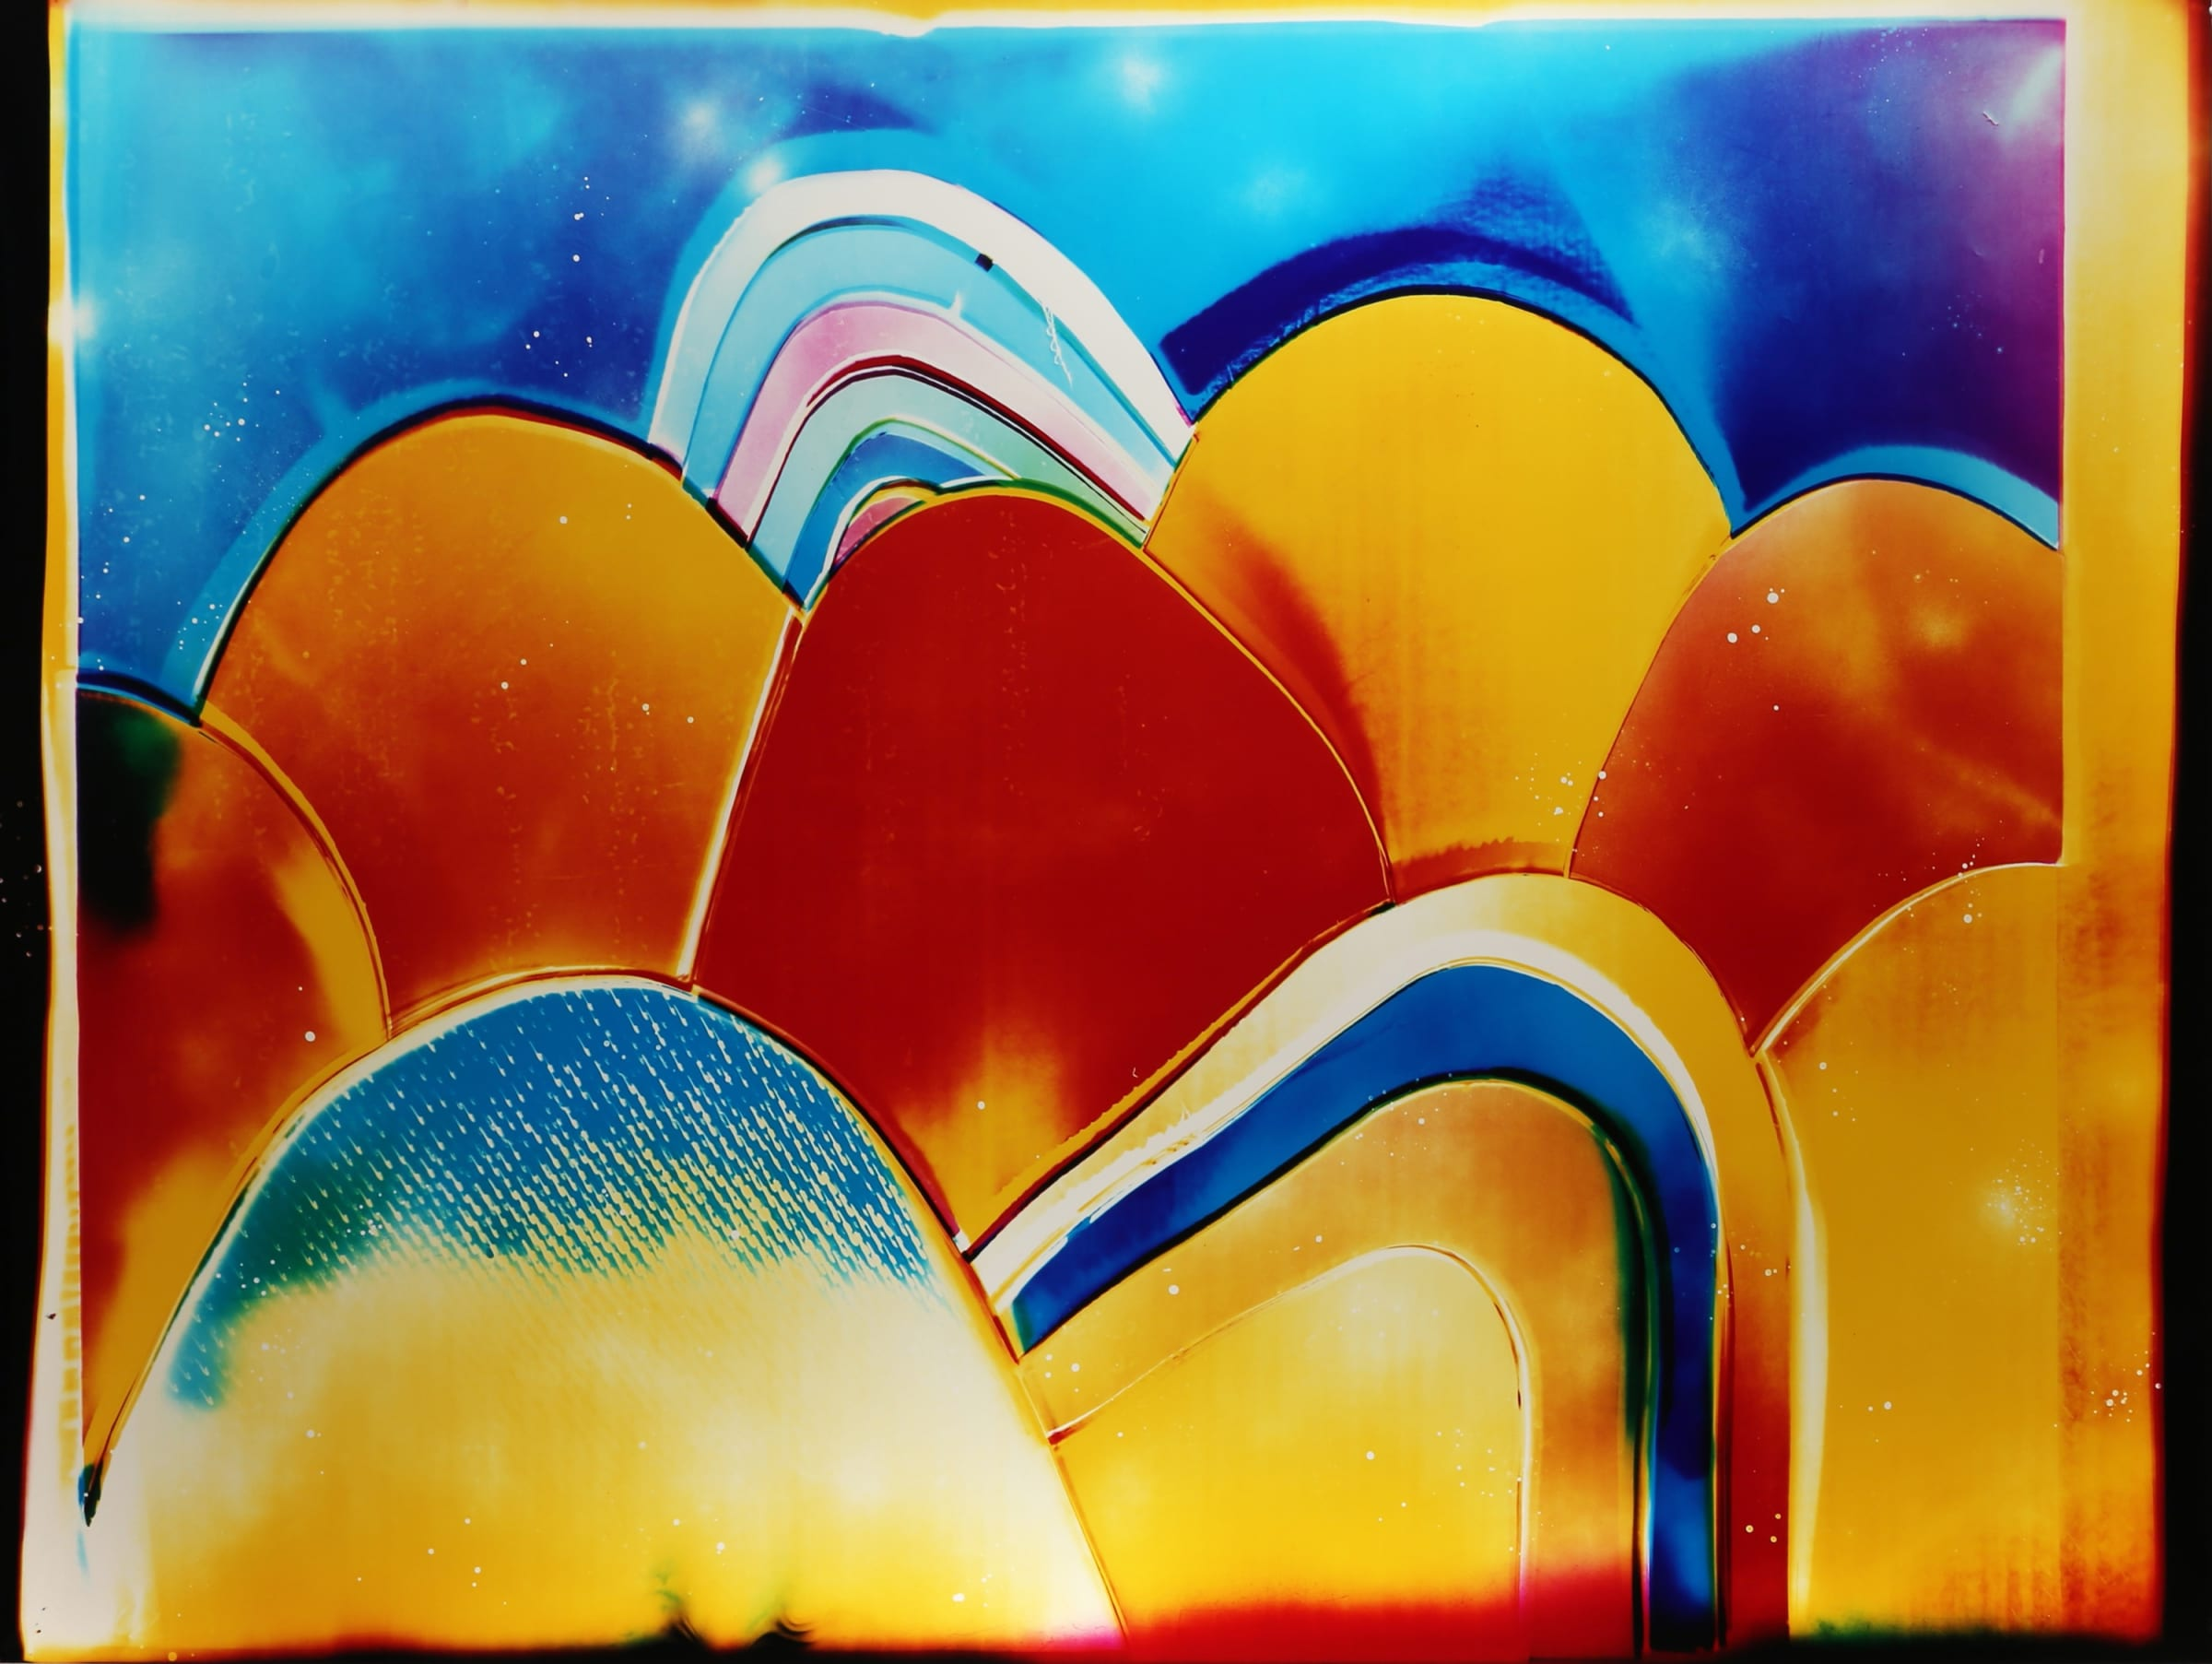 "<span class=""link fancybox-details-link""><a href=""/exhibitions/11/works/artworks141/"">View Detail Page</a></span><div class=""artist""><strong>Liz Nielsen</strong></div><div class=""title""><em>Sun Hills</em>, 2018</div><div class=""signed_and_dated"">Signed, titled and dated on artist's label</div><div class=""medium"">Analogue Chromogenic Photogram on Fujiflex, Unique</div><div class=""dimensions"">127 x 172.7 cm<br>50 x 68 in</div>"